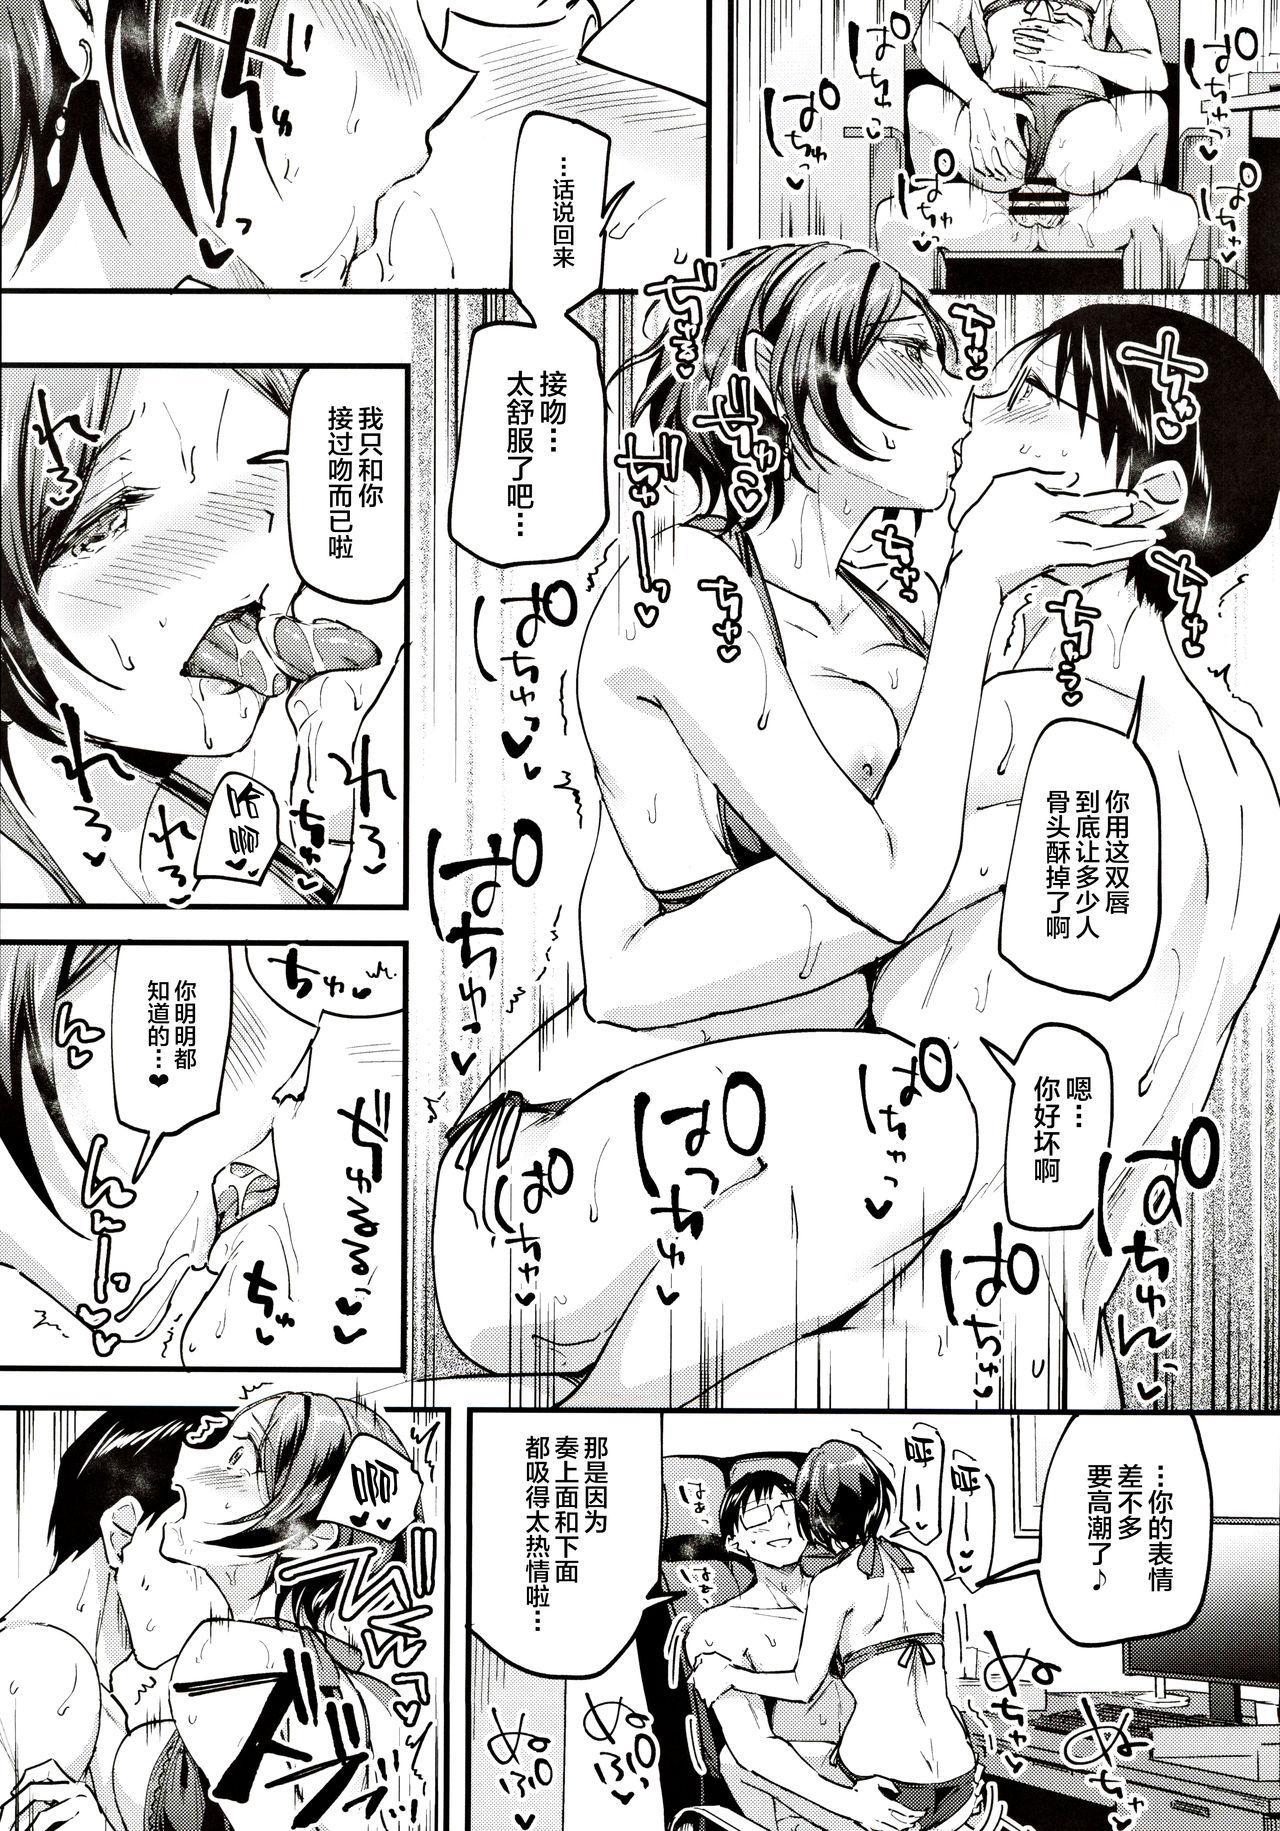 Kanade ga Mizugi ni Kigaetara 23